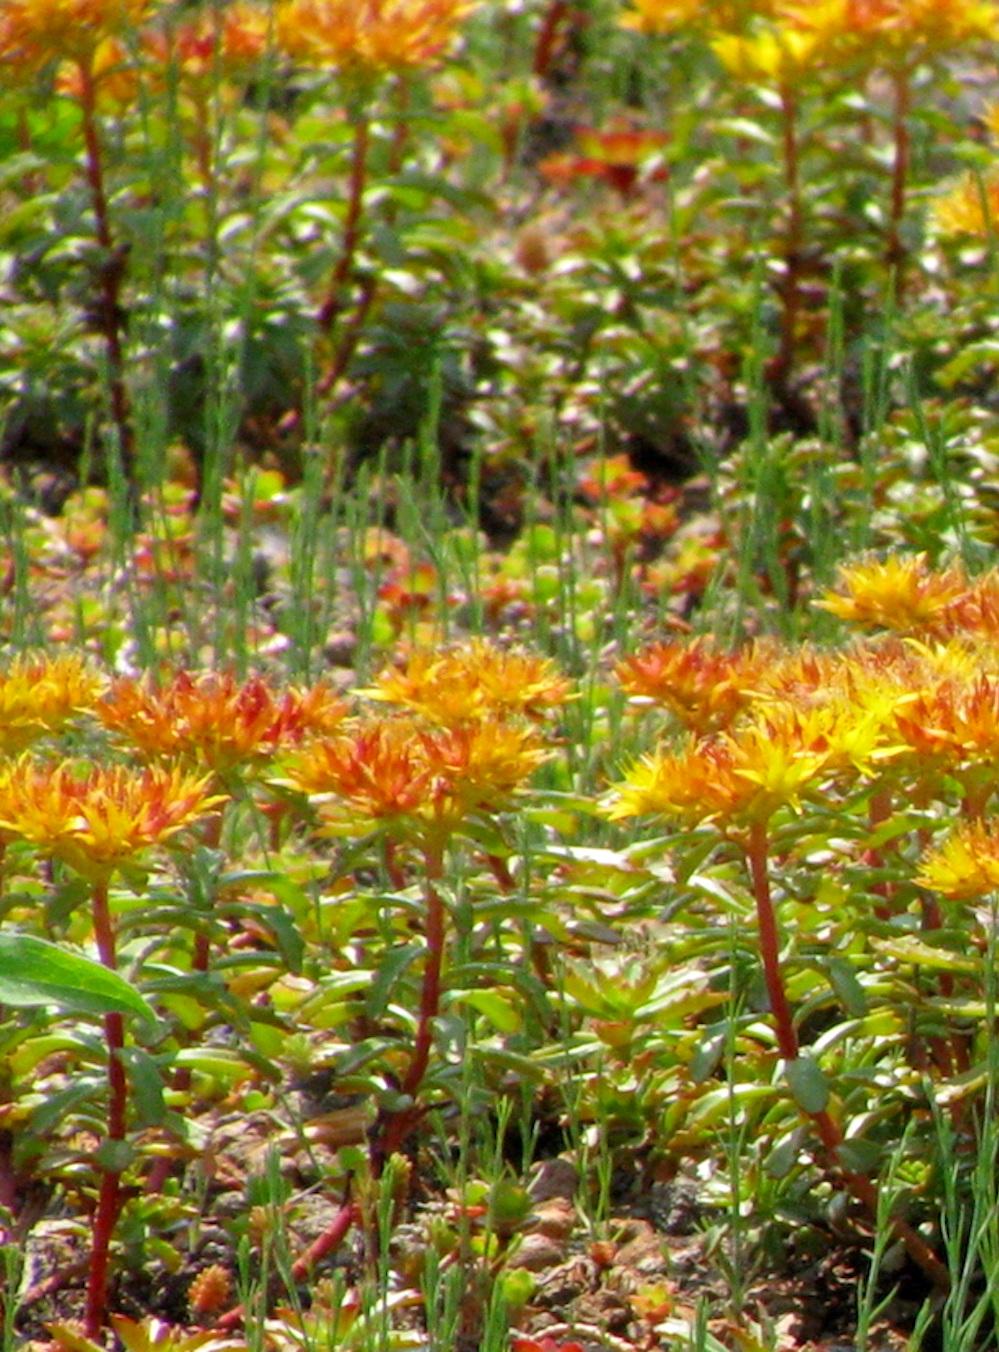 ecogardens-walmart-chatham-34.jpg